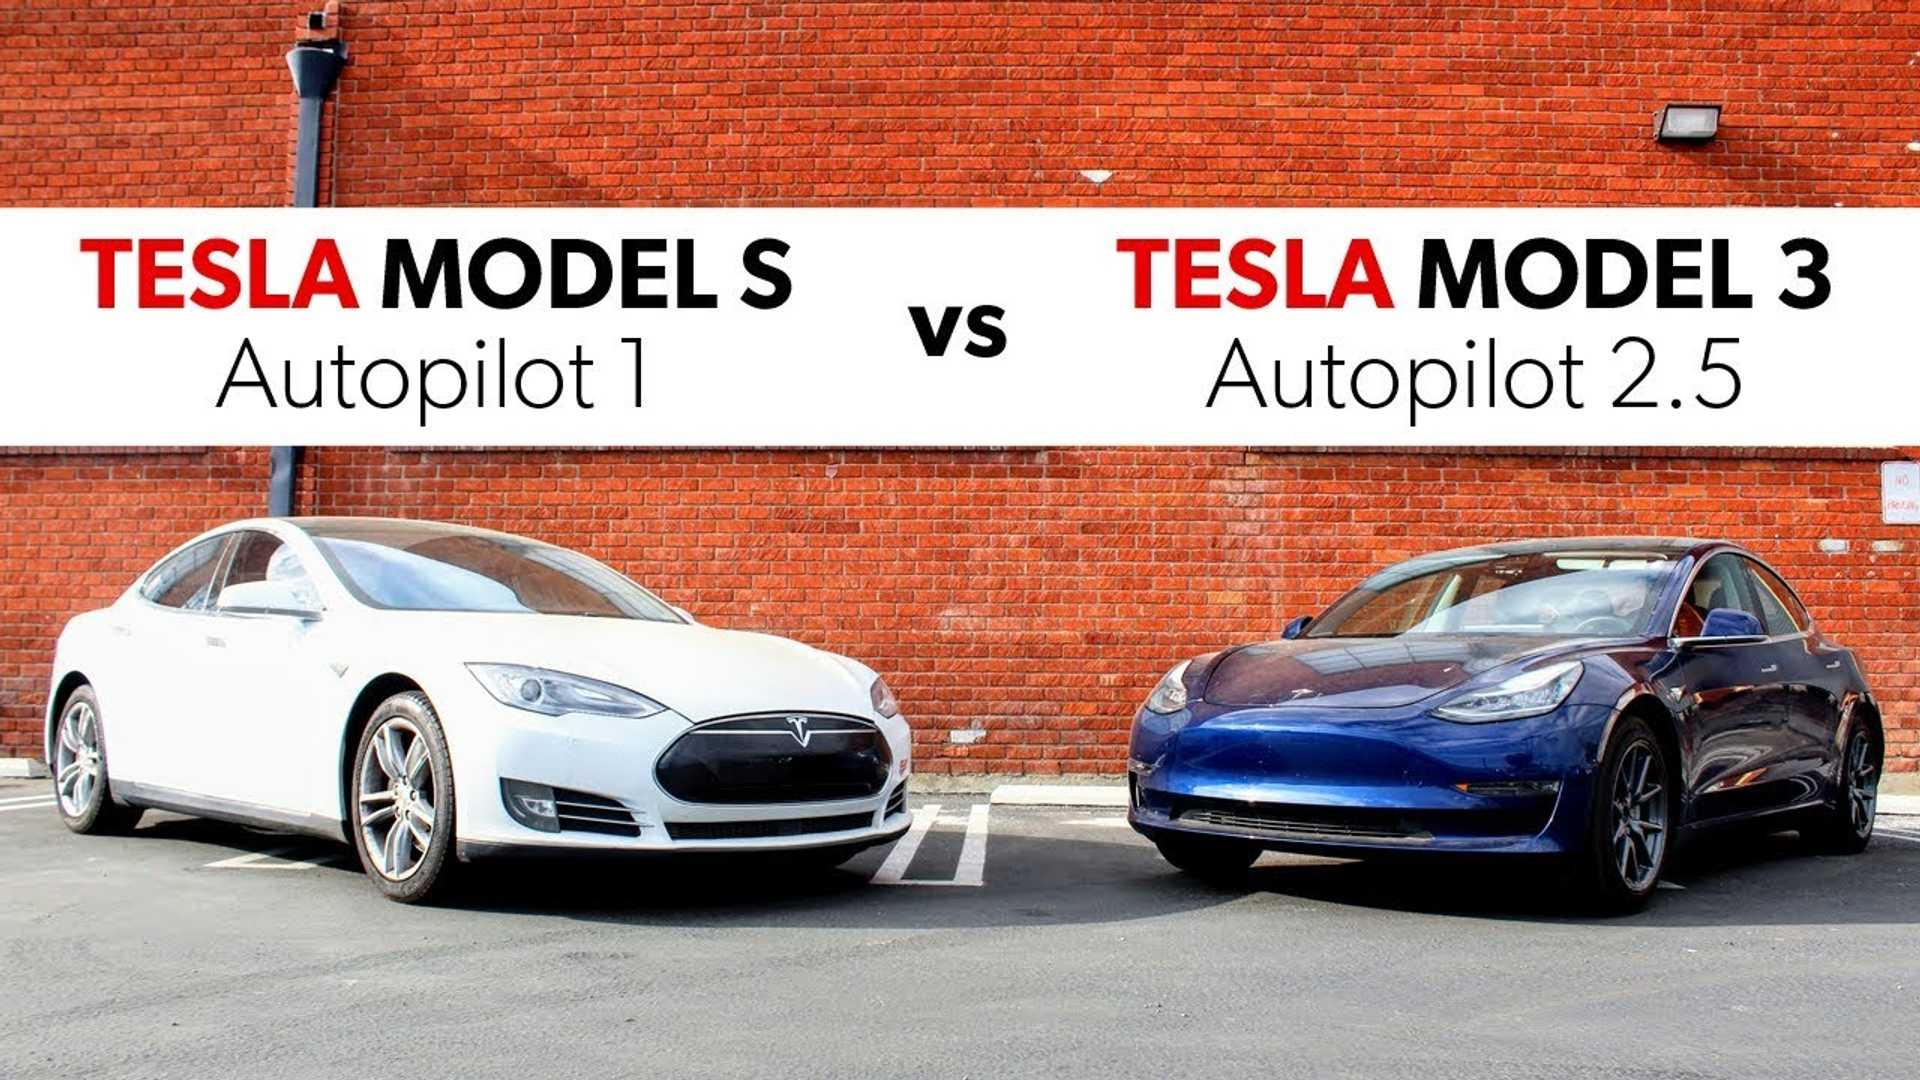 Tesla Autopilot Progress 2015 Model S Vs 2018 Model 3 On Canyon Road